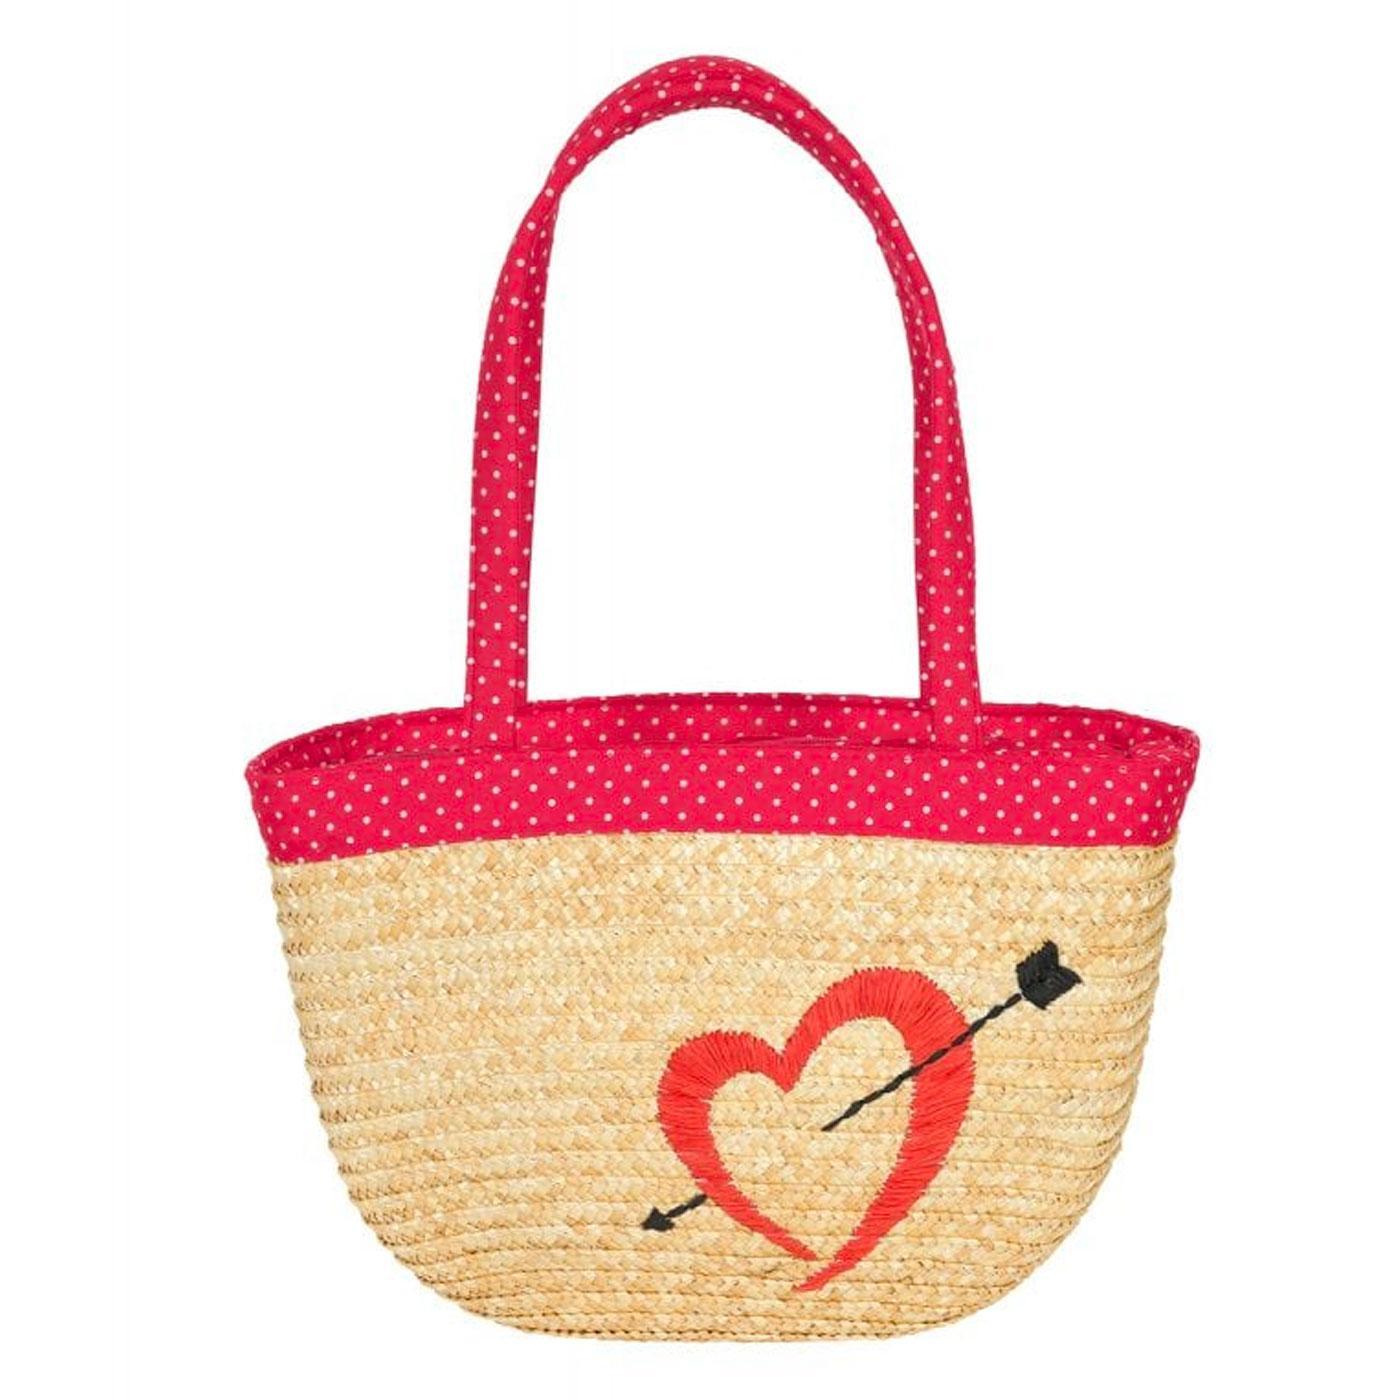 Mimi COLLECTIF Polka Dot Love Heart Straw Handbag